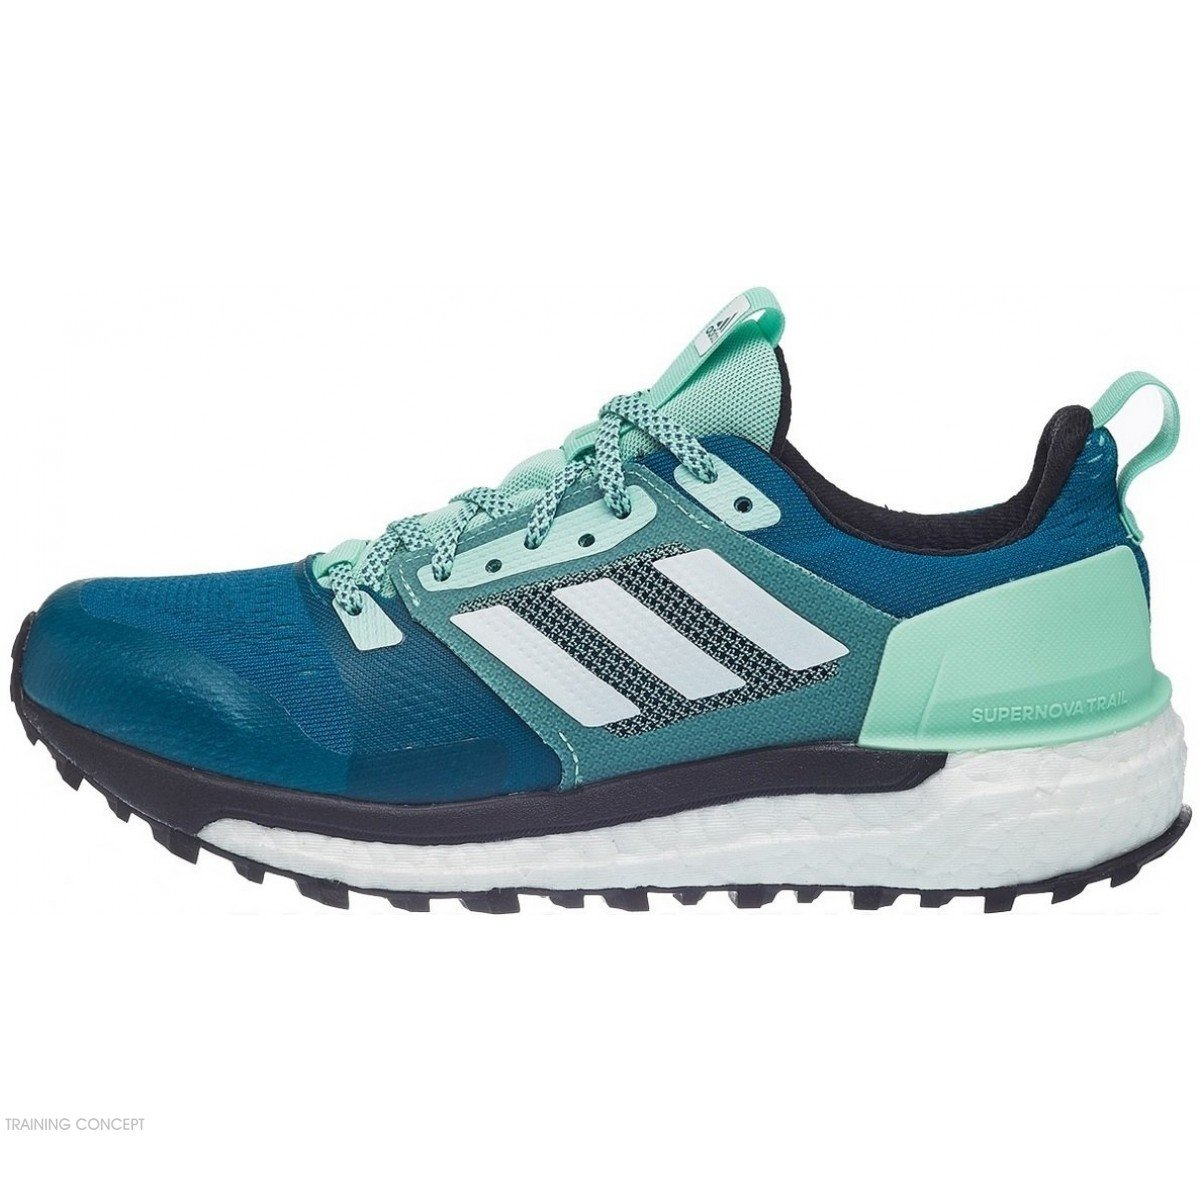 chaussures de trail running pour femmes adidas supernova